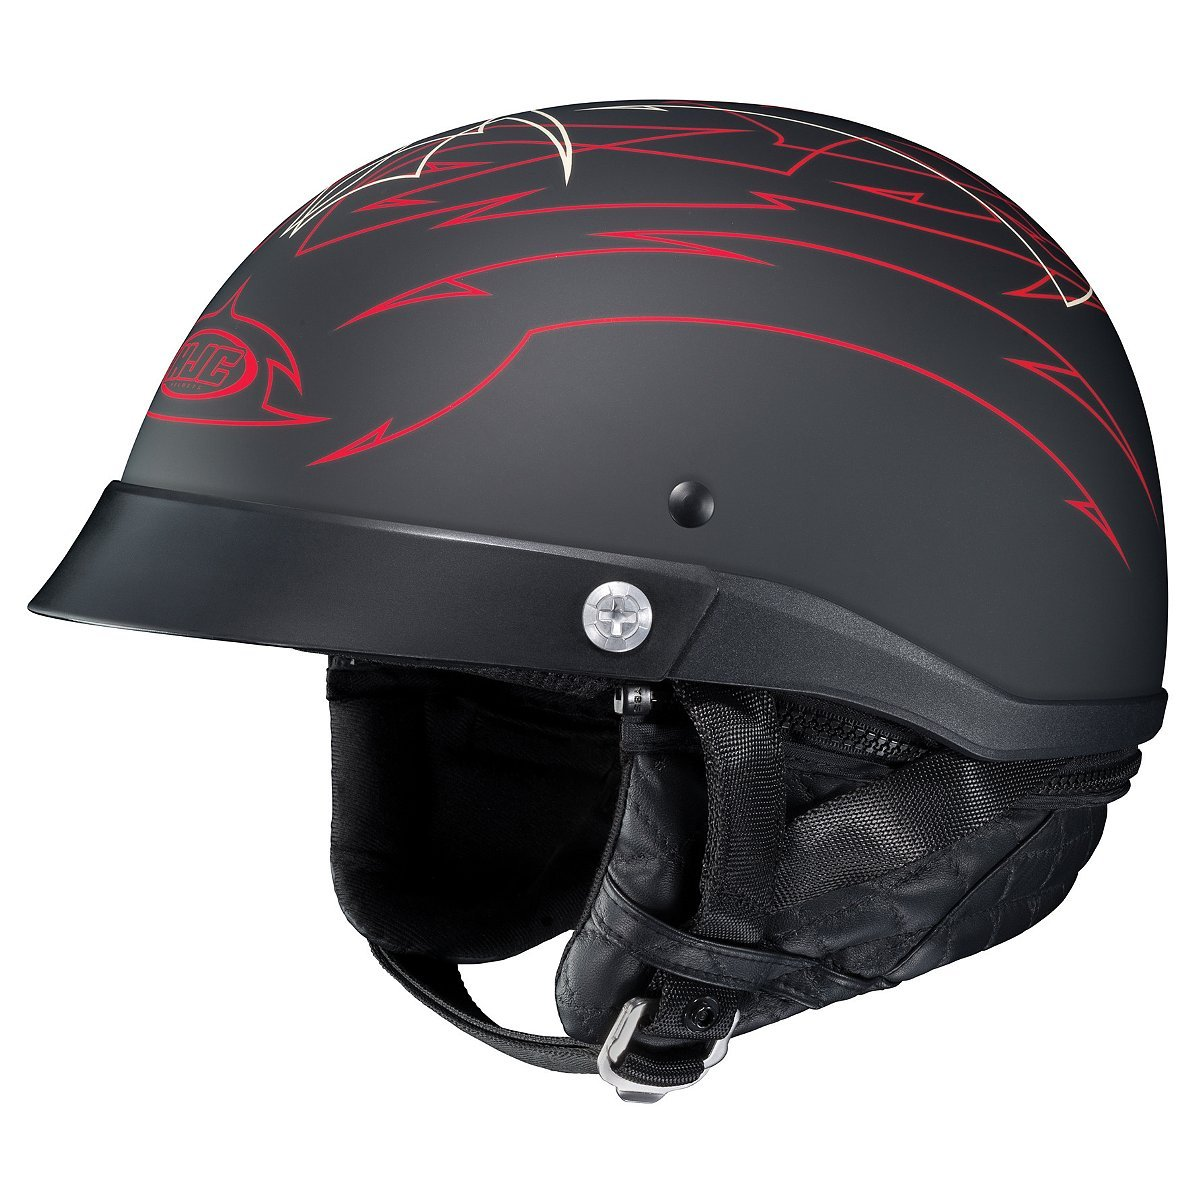 HJC Helmets Unisex-Adult Half-Size-Helmet-Style CL-Iron Road Show Boat MC1F Helmet (Black/Red, Small)